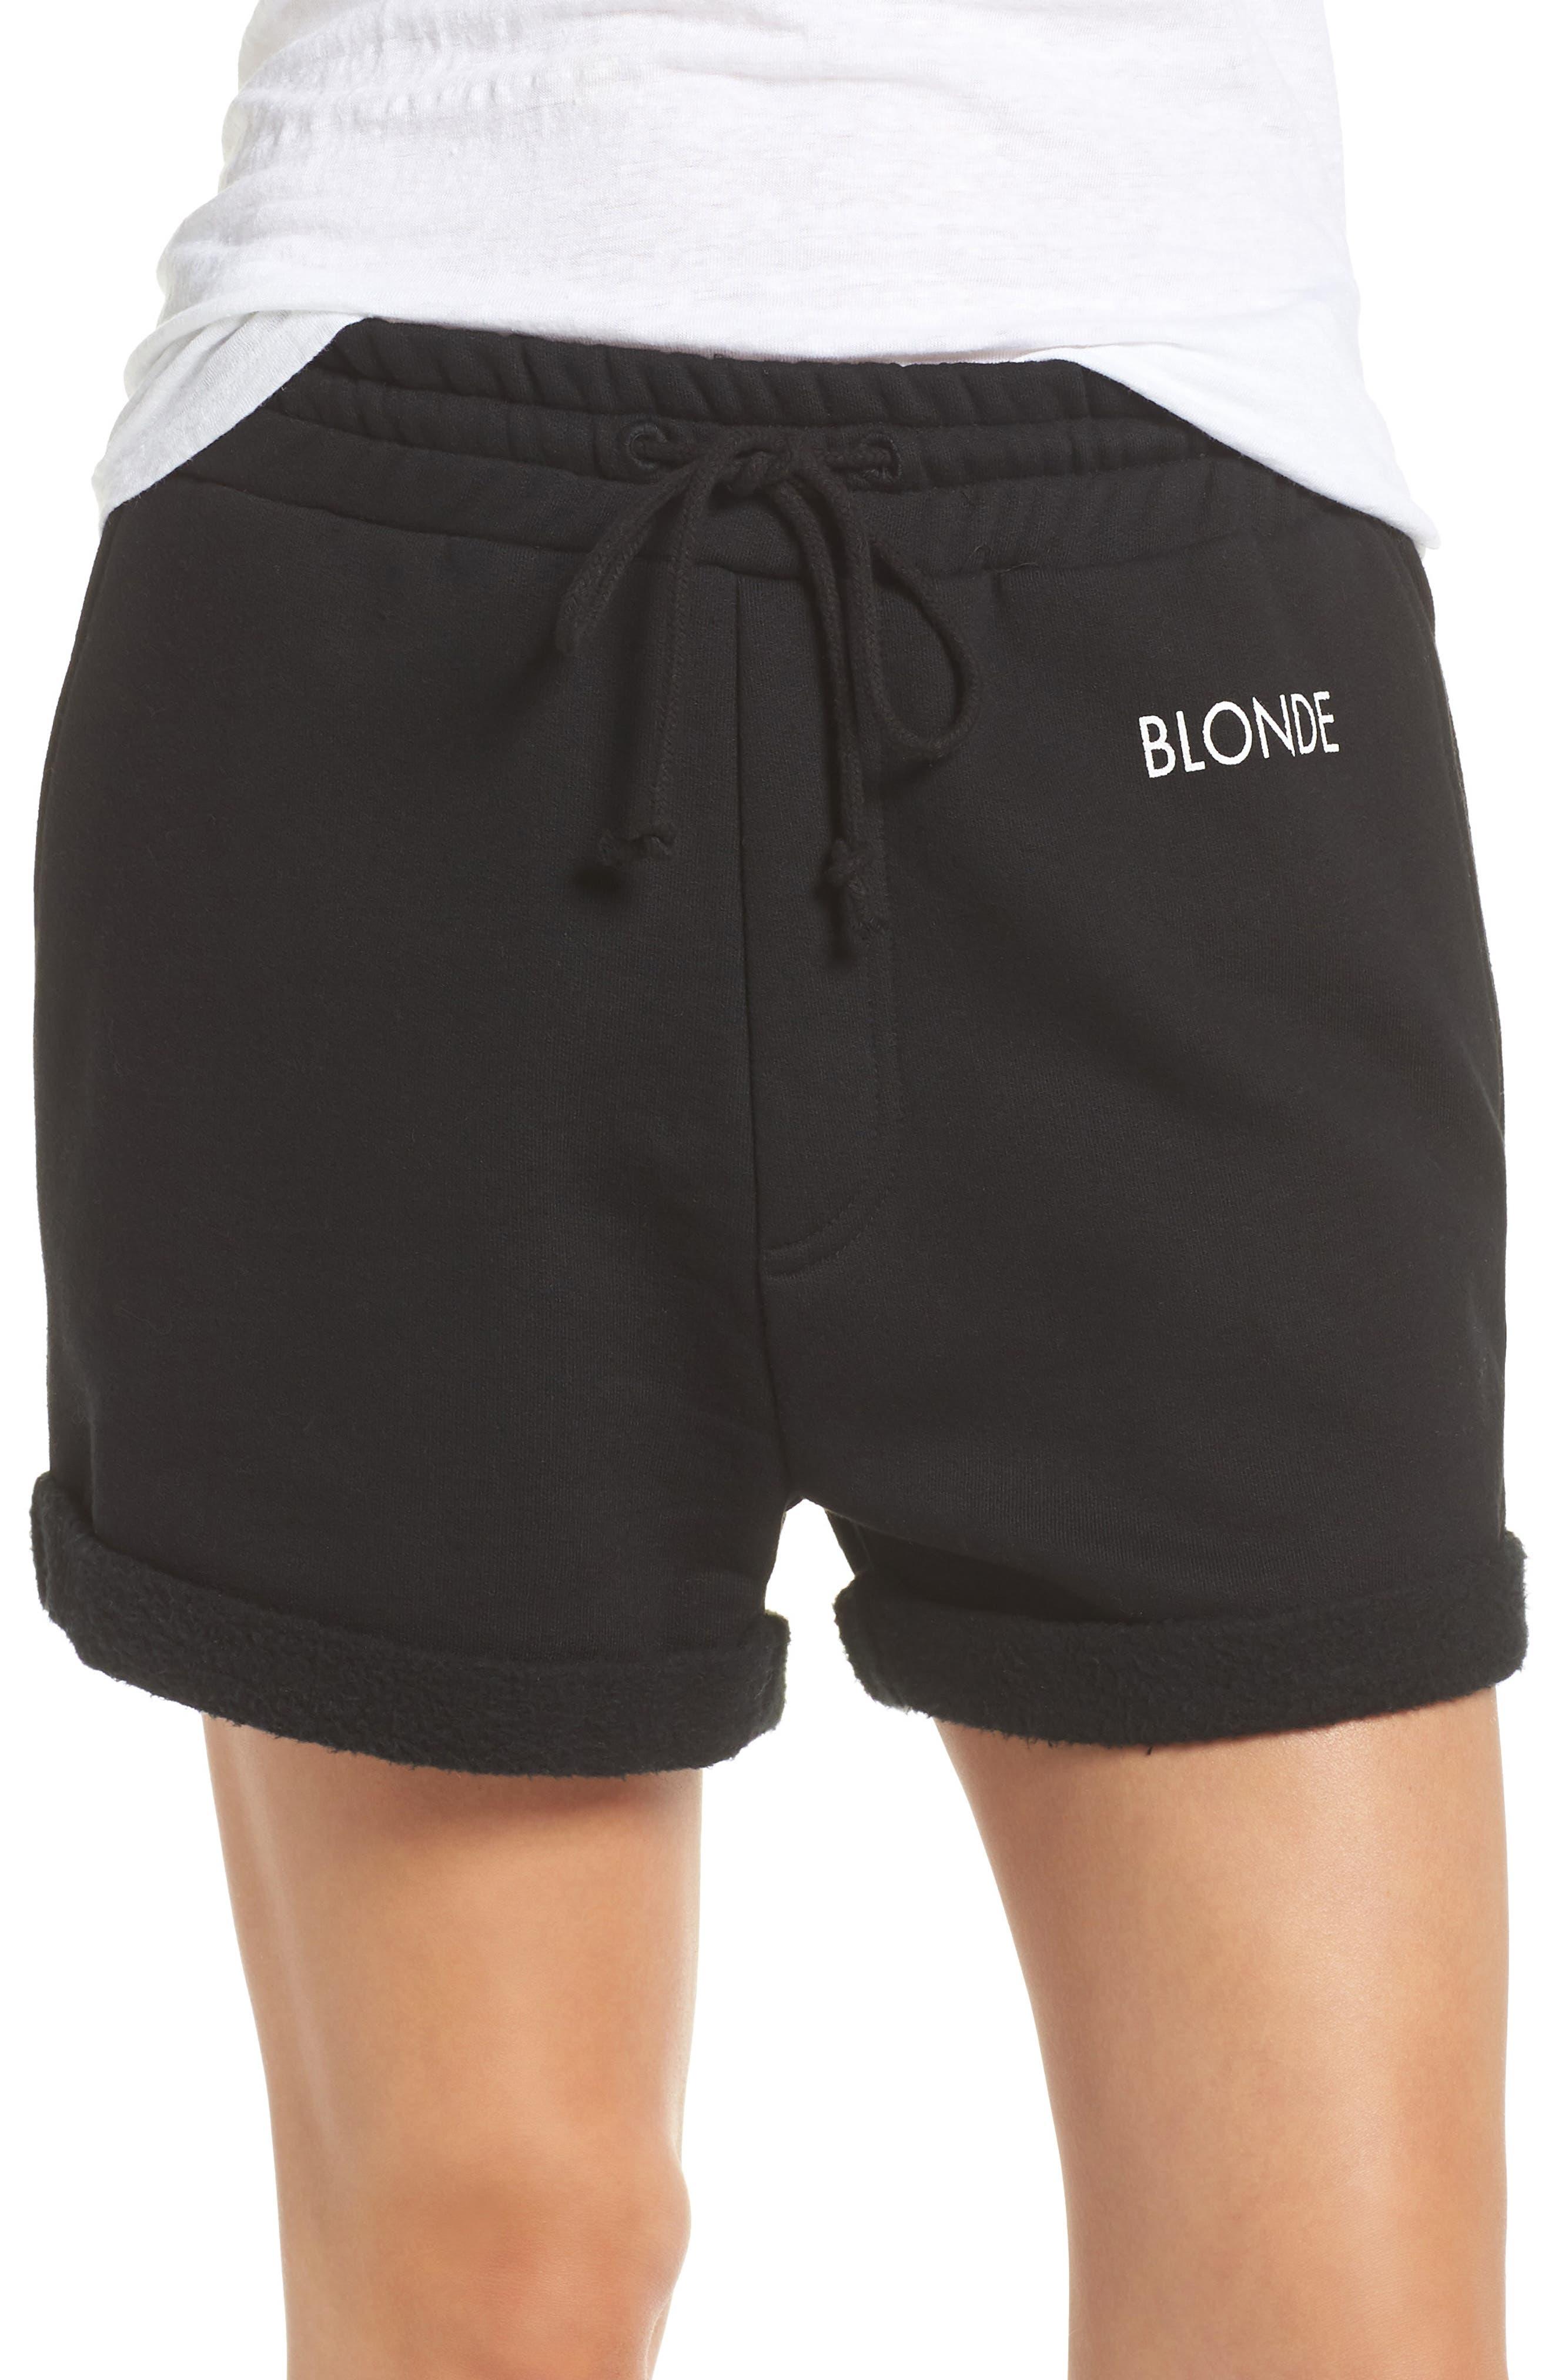 Blonde Lounge Shorts,                             Main thumbnail 1, color,                             008